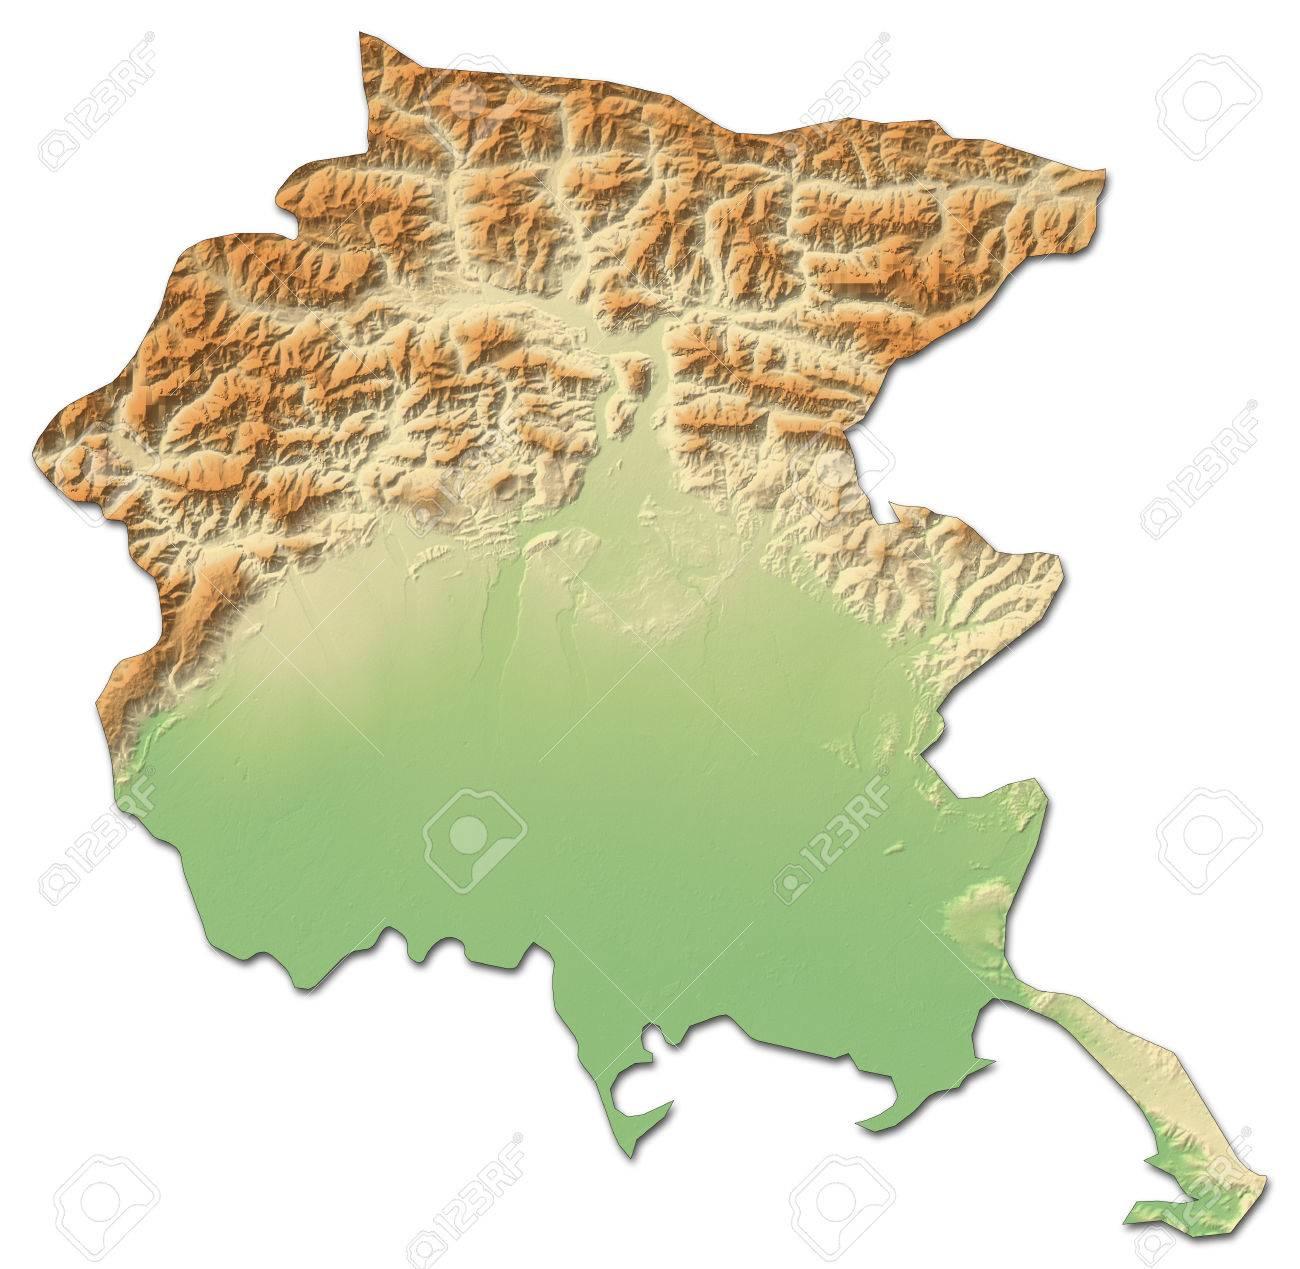 Cartina Fisica Del Friuli Venezia Giulia.Relief Map Of Friuli Venezia Giulia A Province Of Italy With Stock Photo Picture And Royalty Free Image Image 63796434